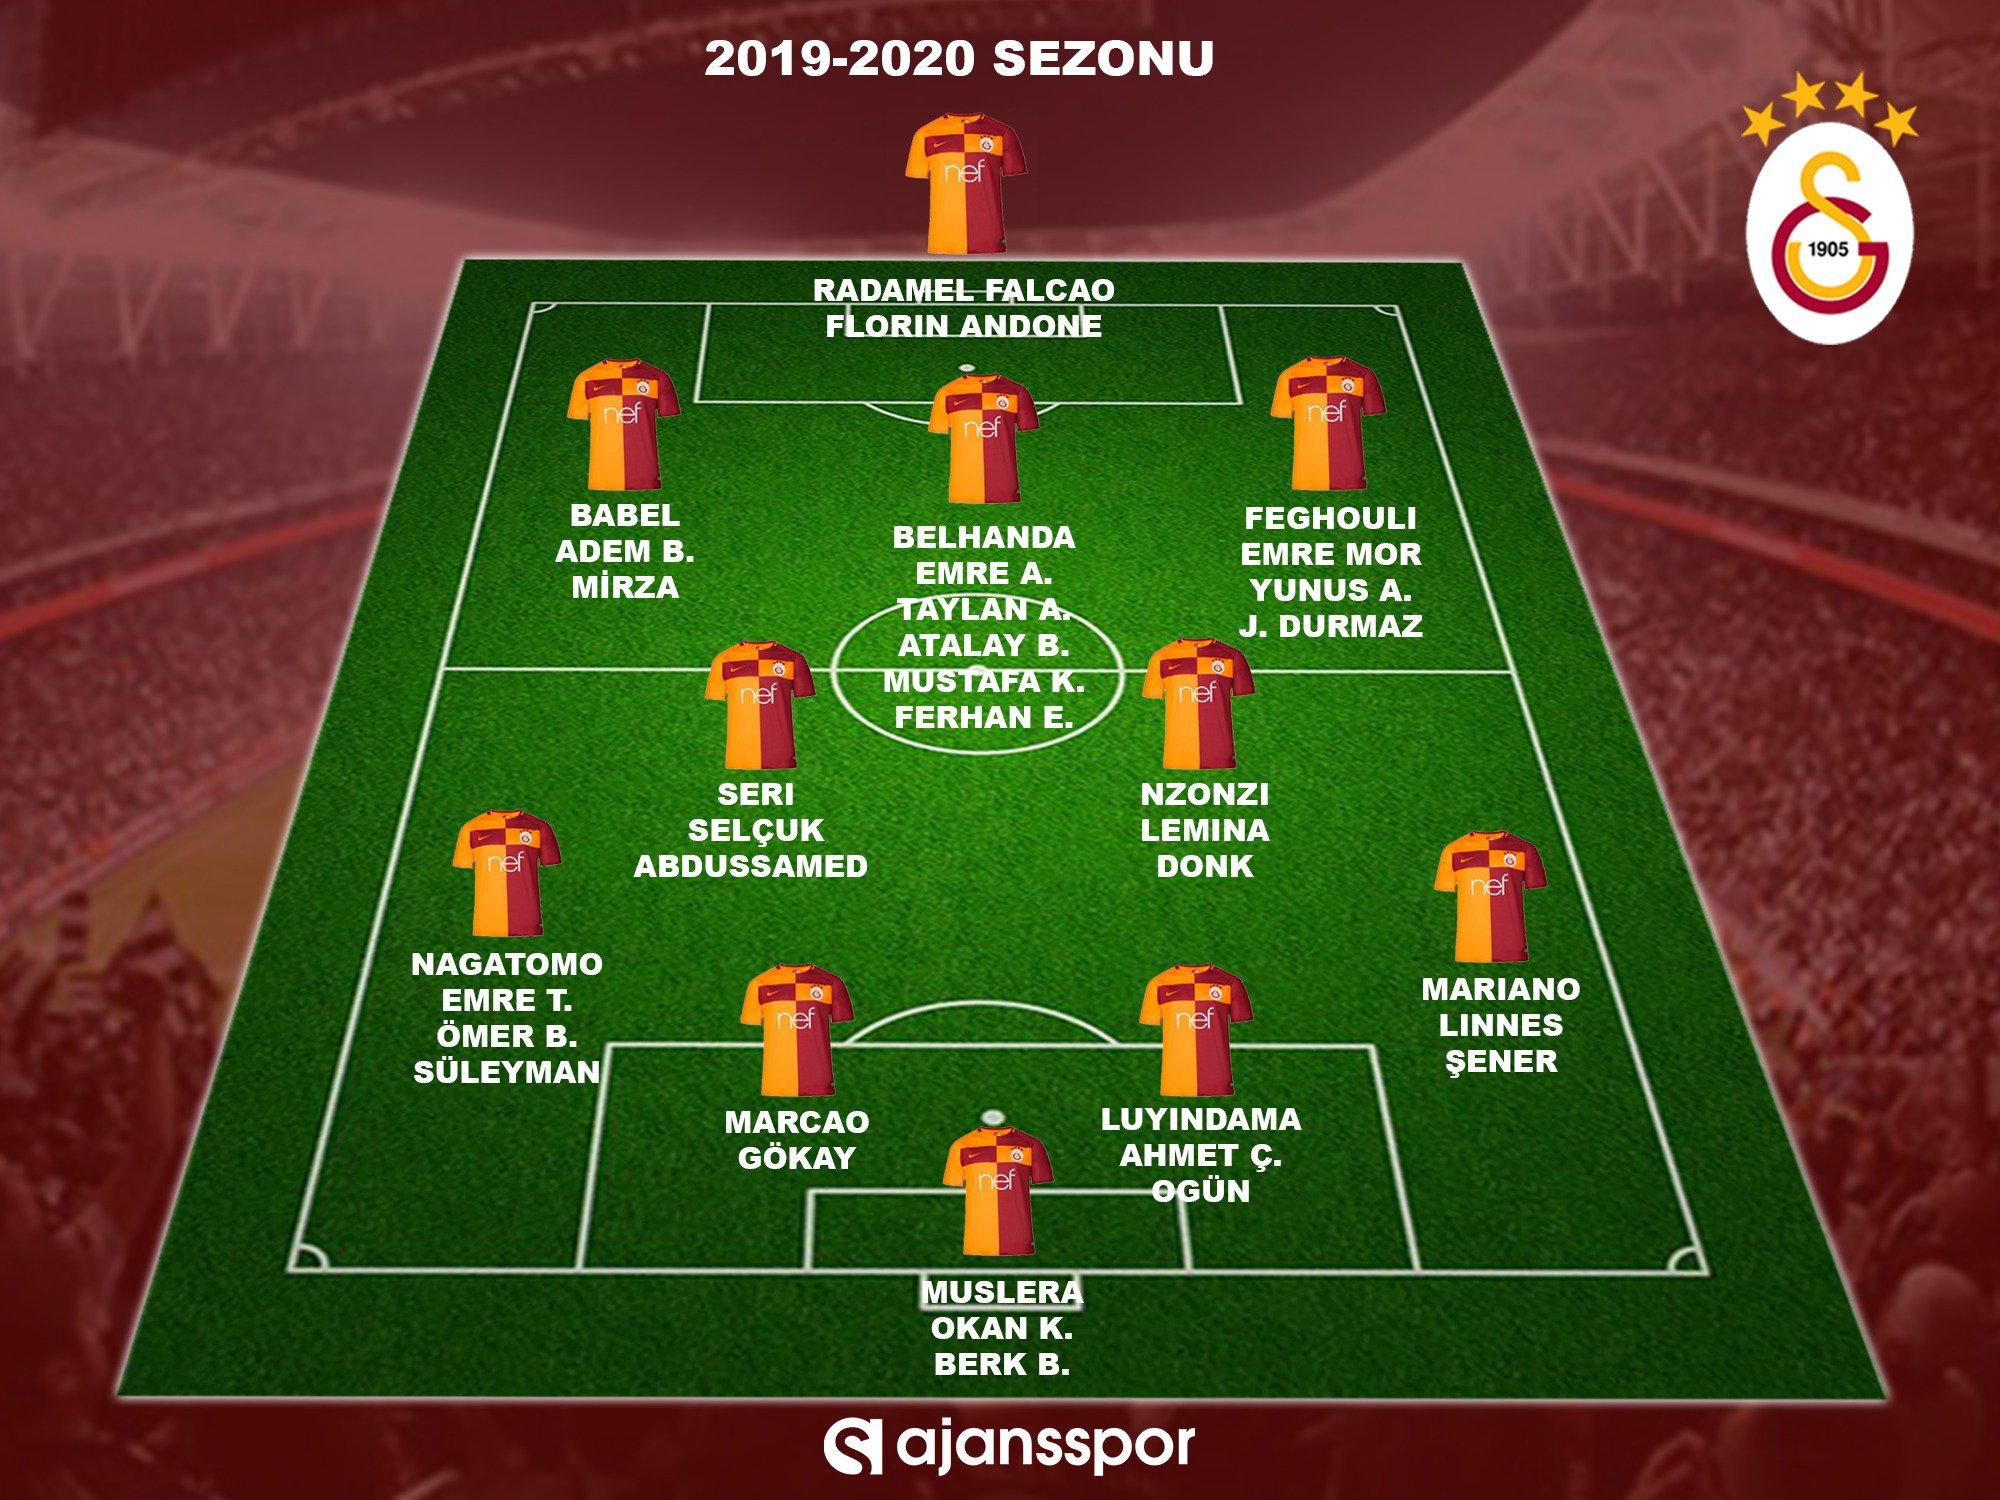 Galatasaray 2019-2020 sezonu kadrosu